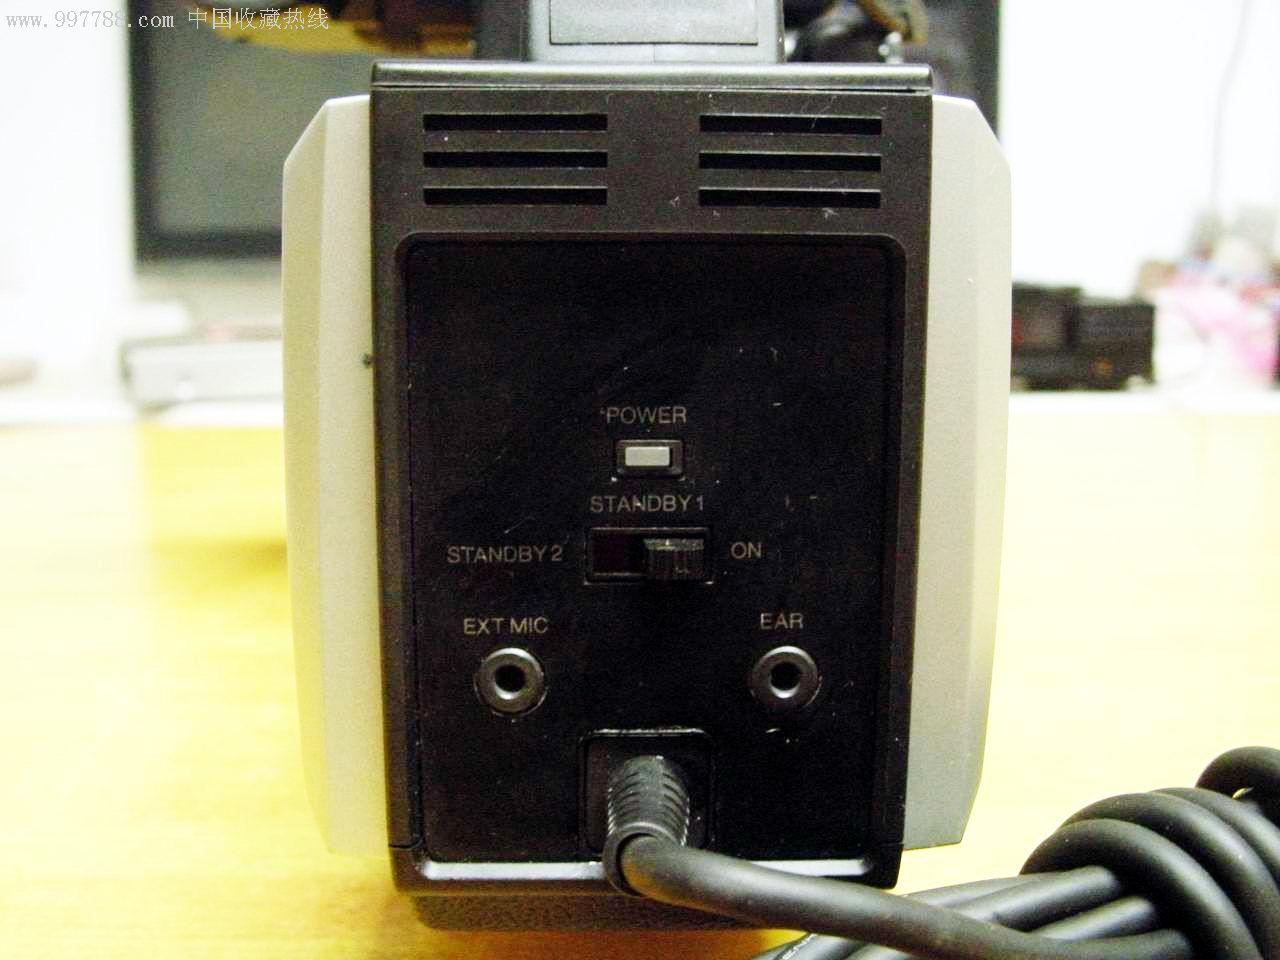 松下wvp-100n摄像机